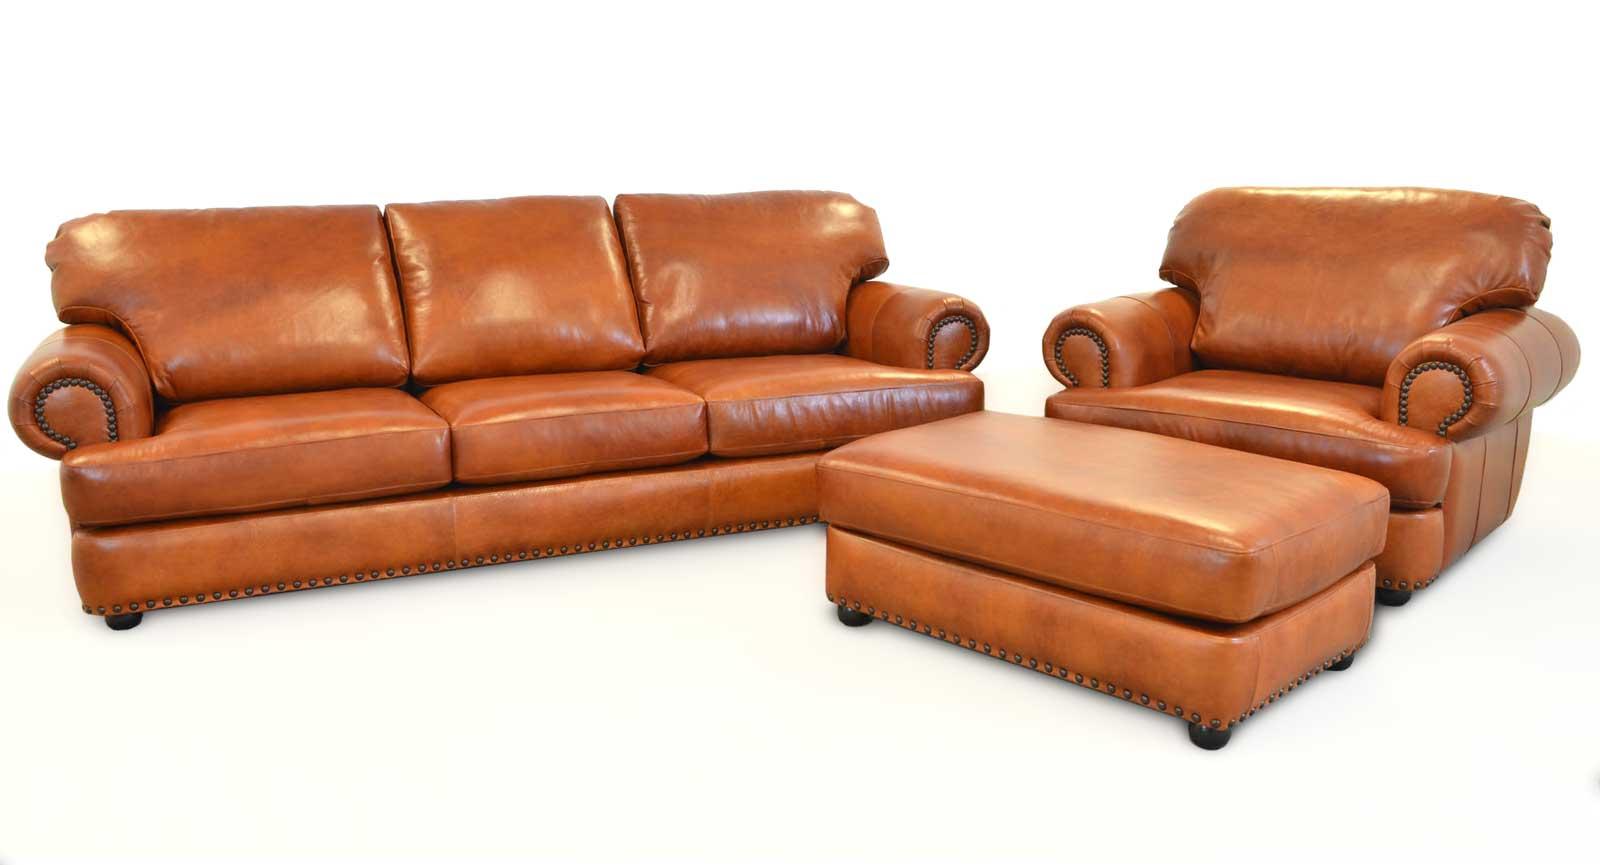 Three Seat Sofa Chair And Half Ottoman A